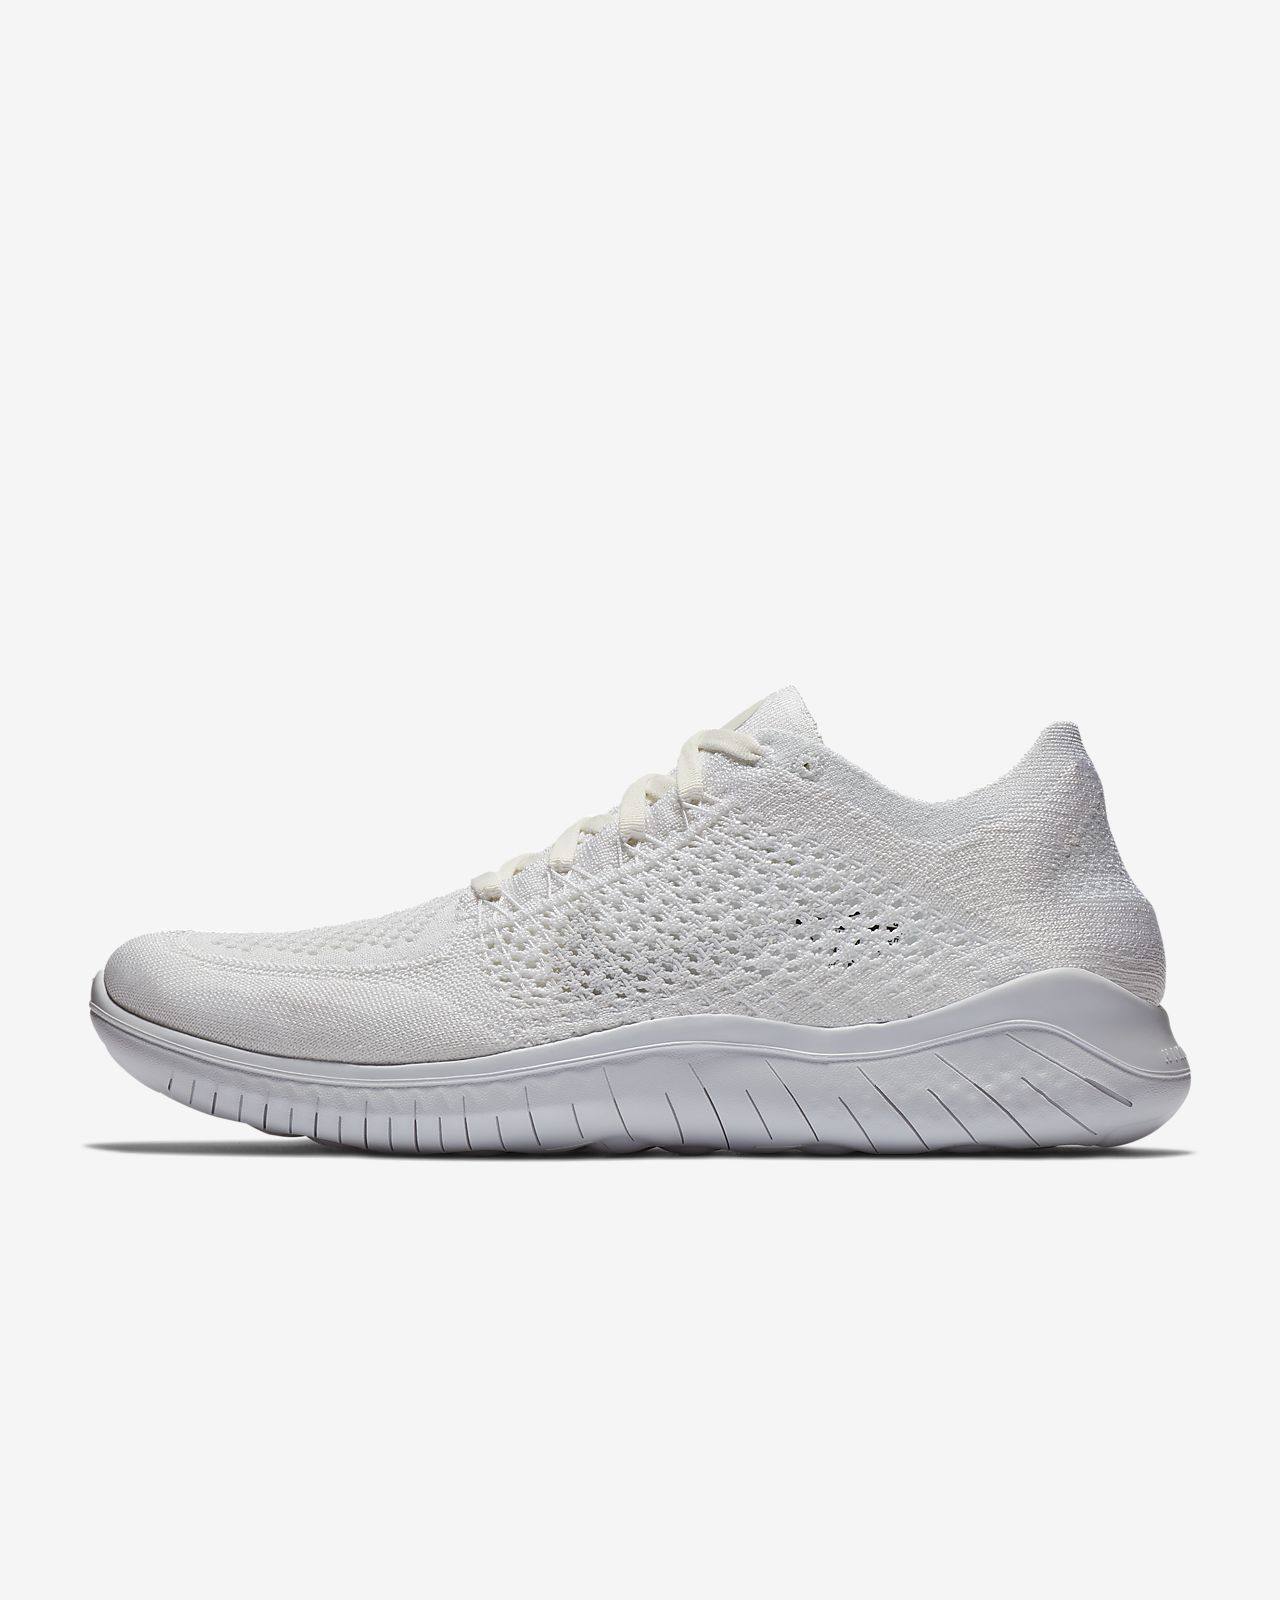 70d3610e72a65 ... wholesale nike free rn flyknit 2018 mens running shoe a64d4 00f03